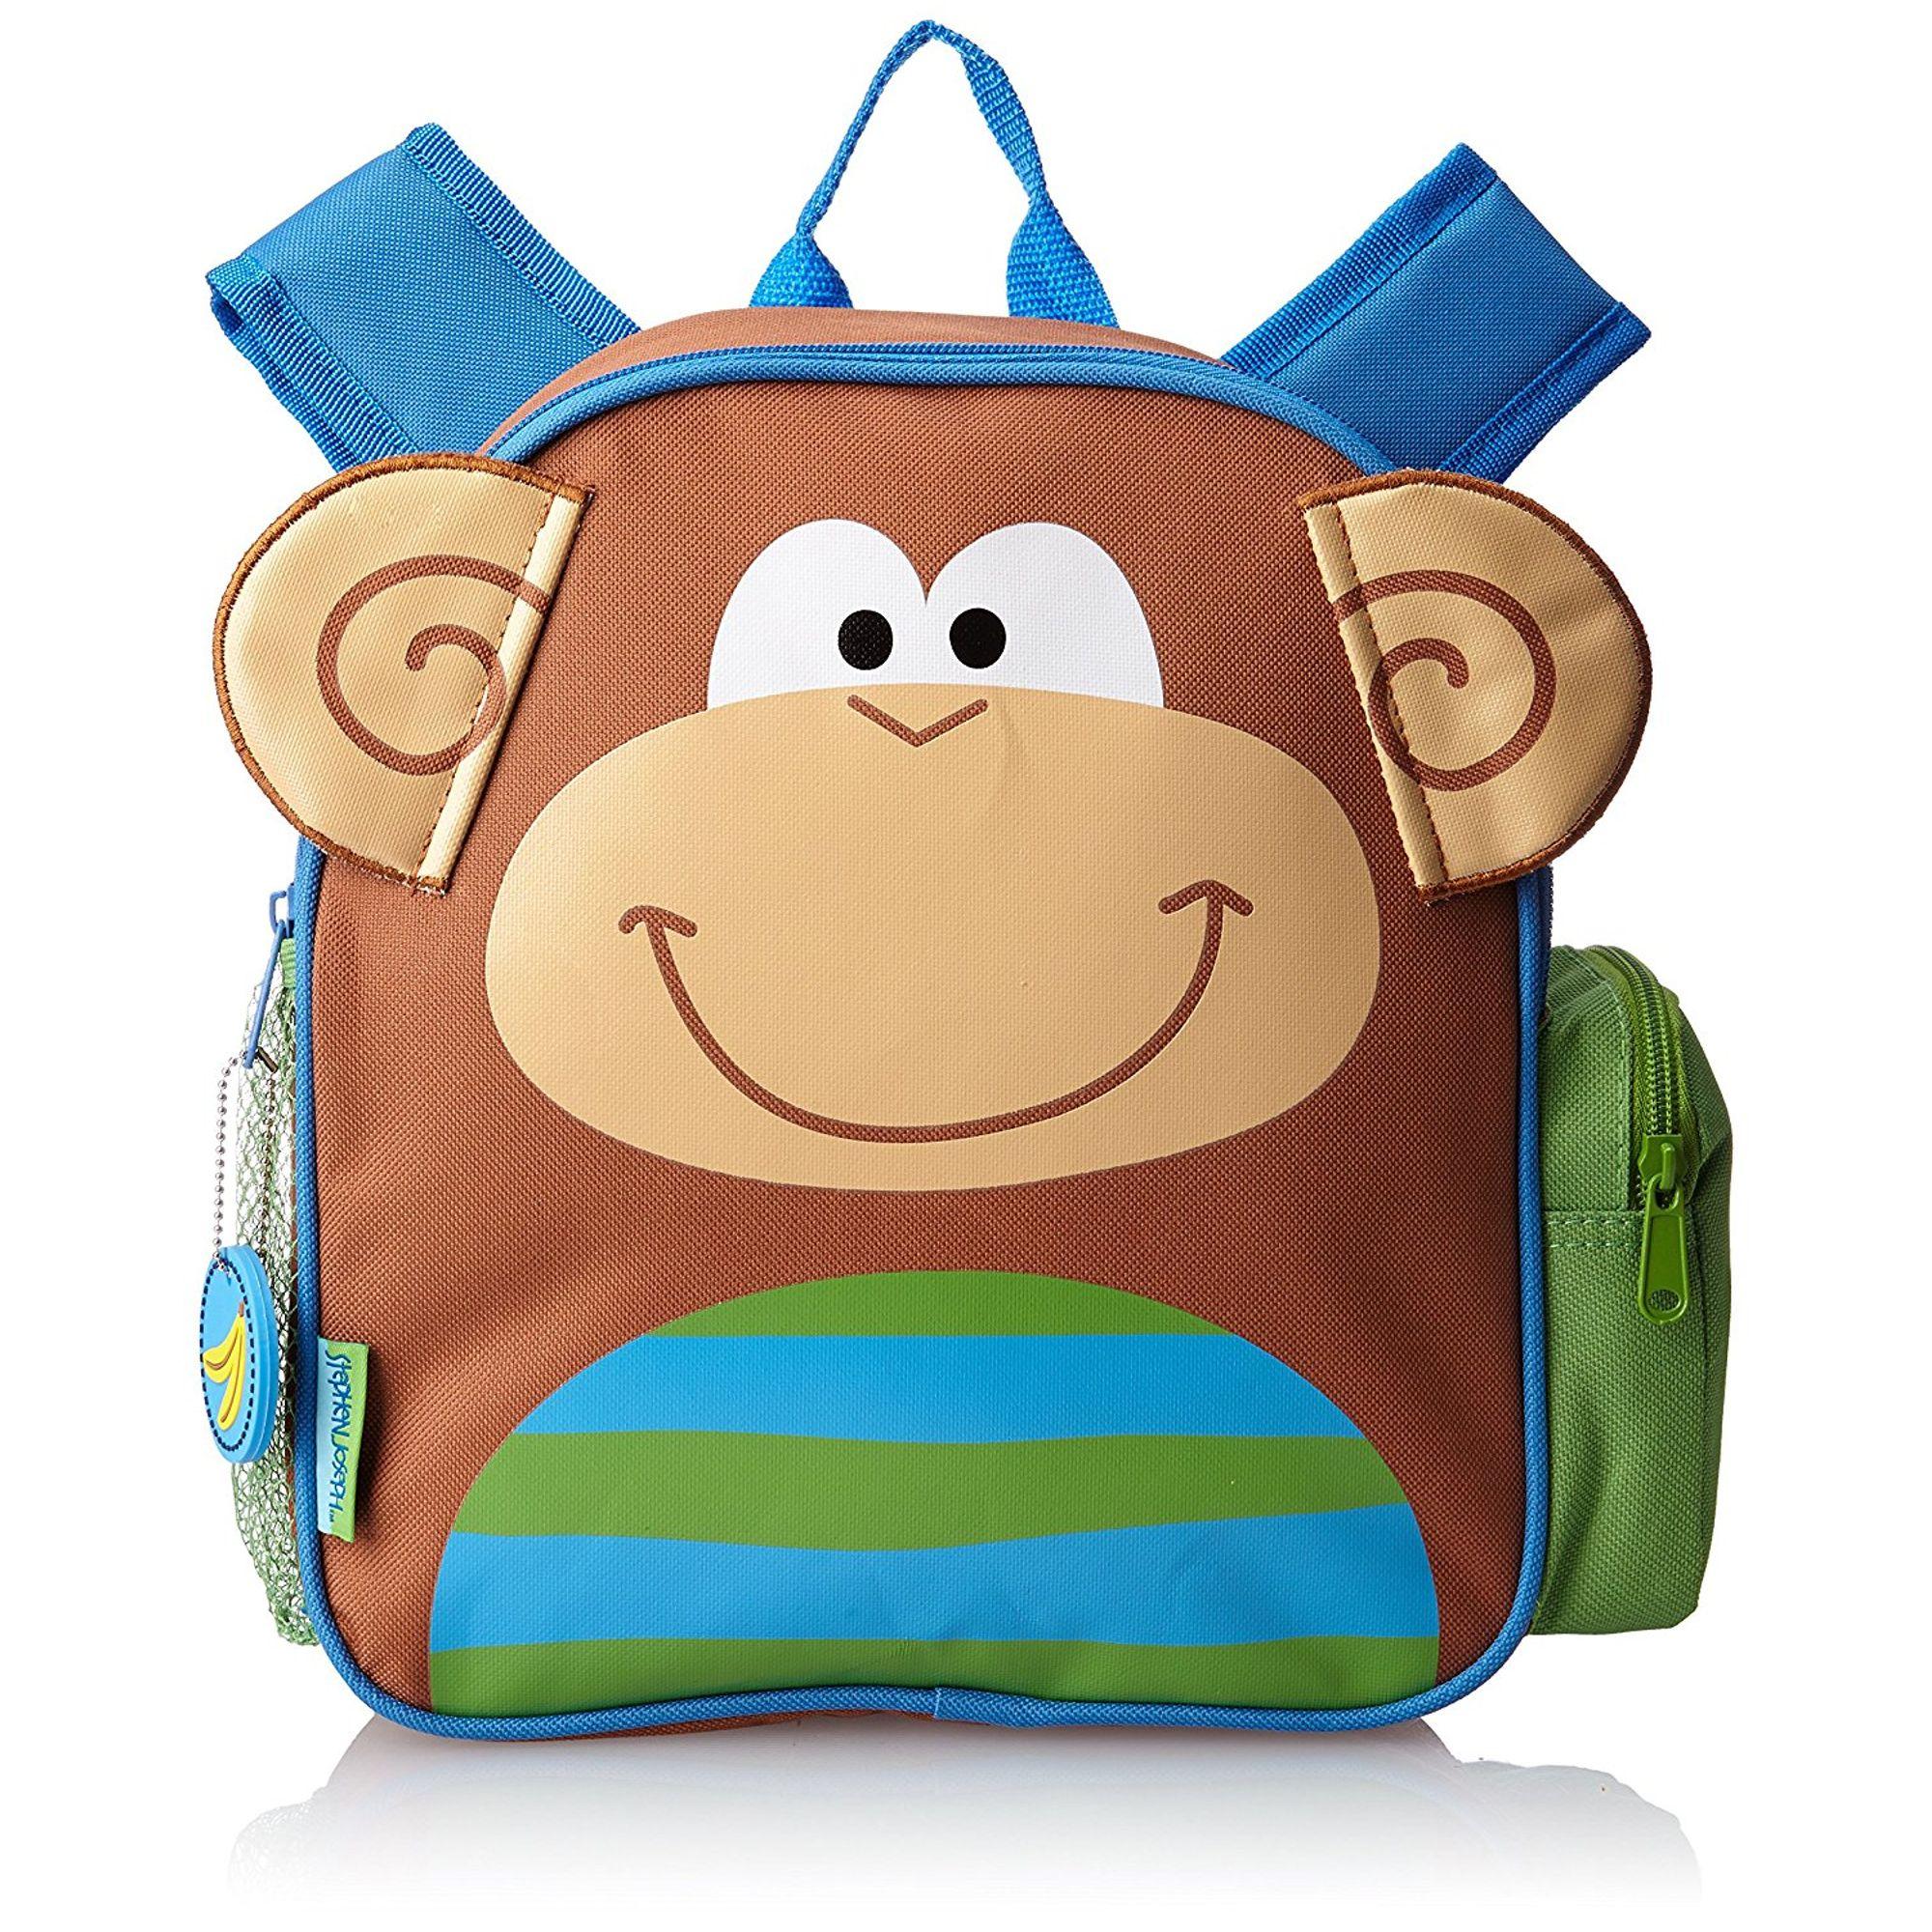 mochilha-infantil-passeio-macaco-stephen-joseph